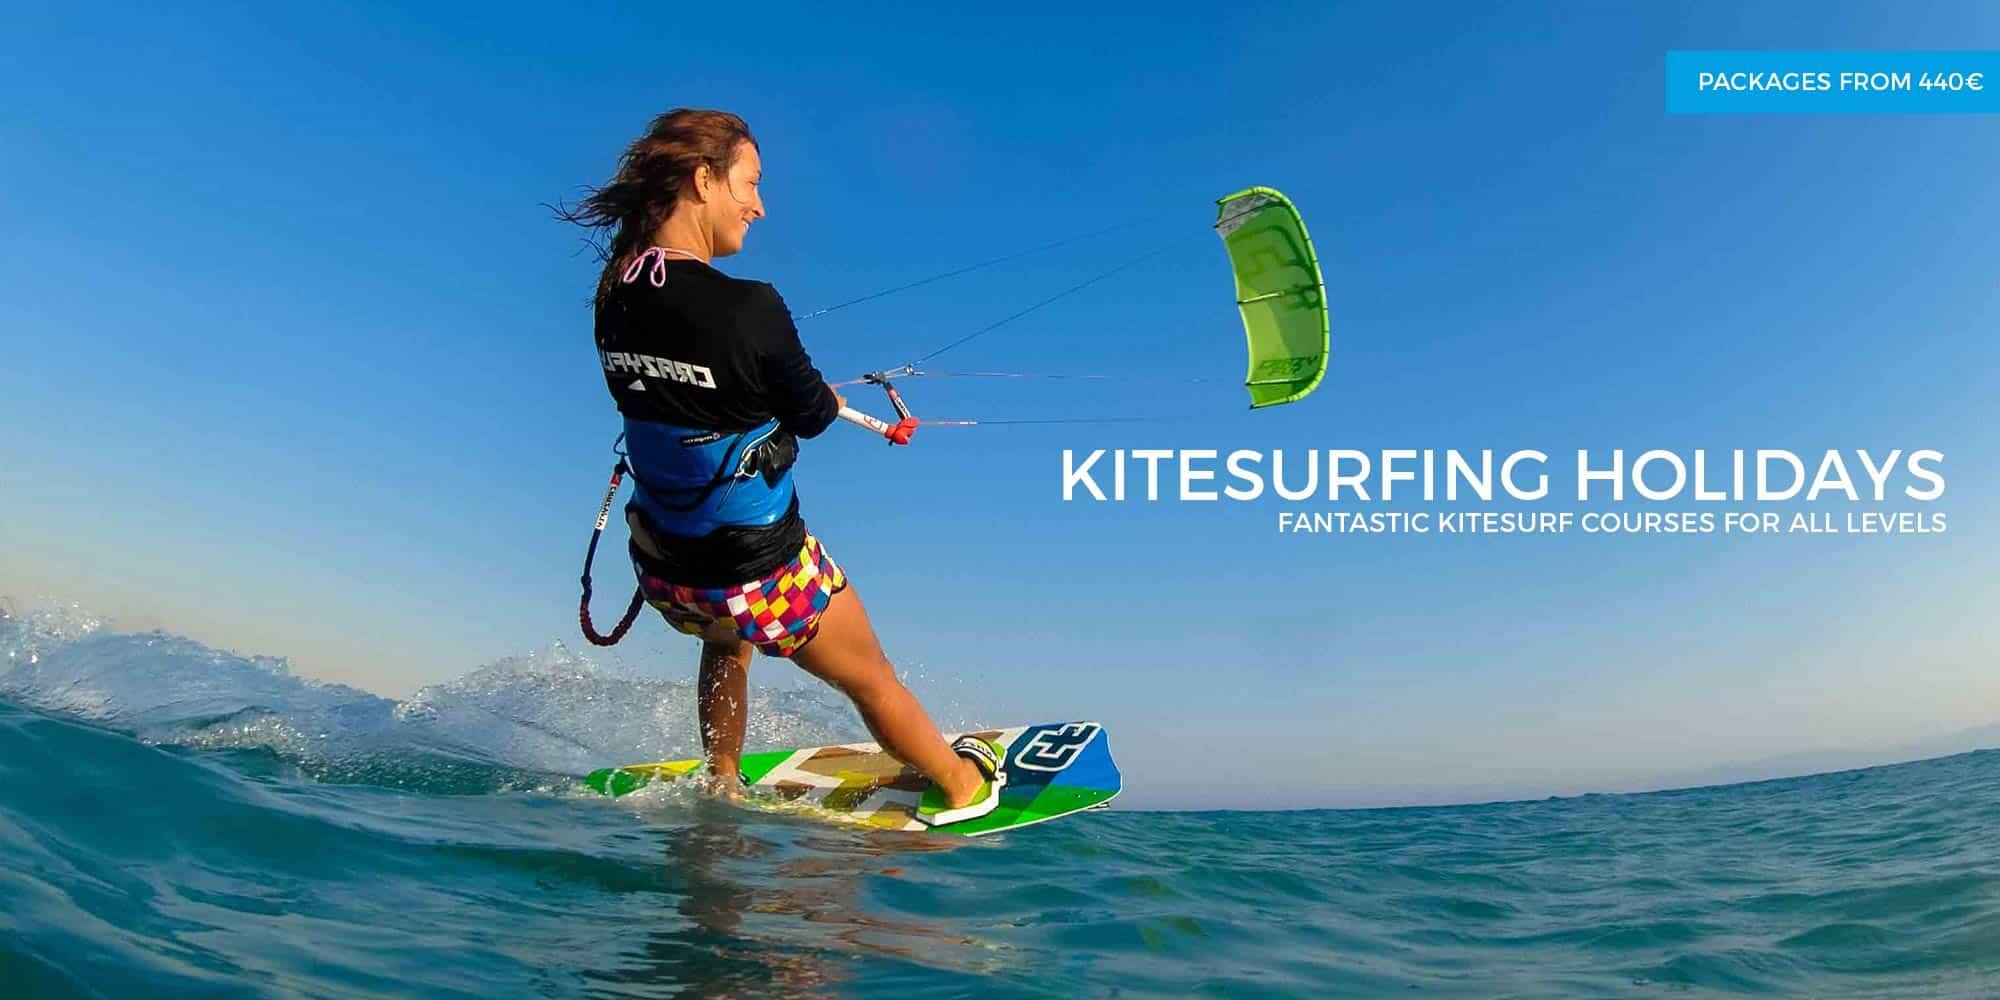 Kitesurfing Holidays in the Algarve Portugal - AltaVista Lodge